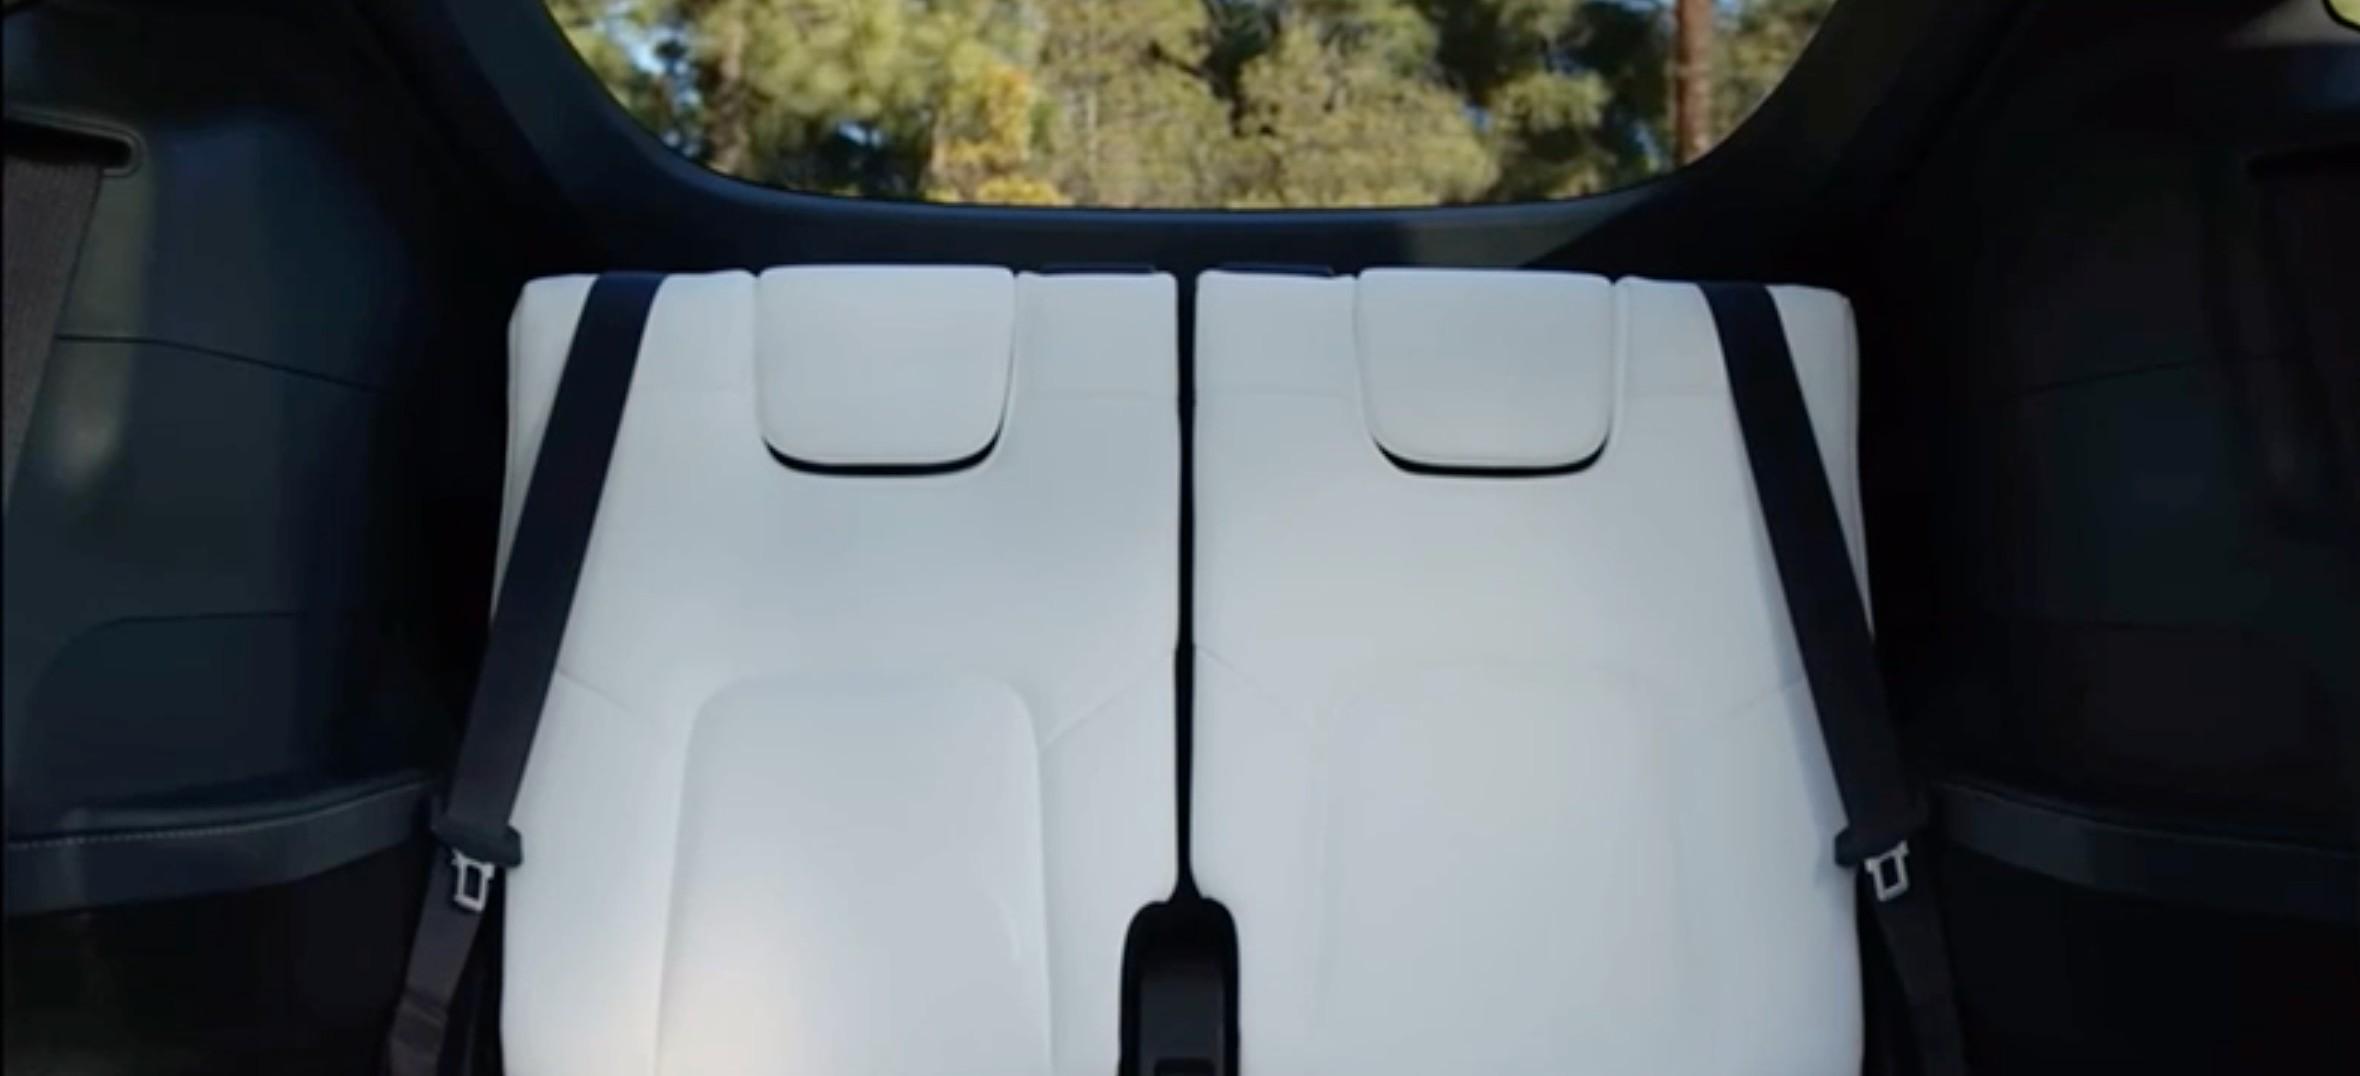 tesla-model-y-seven-seater-third-row-video (1)